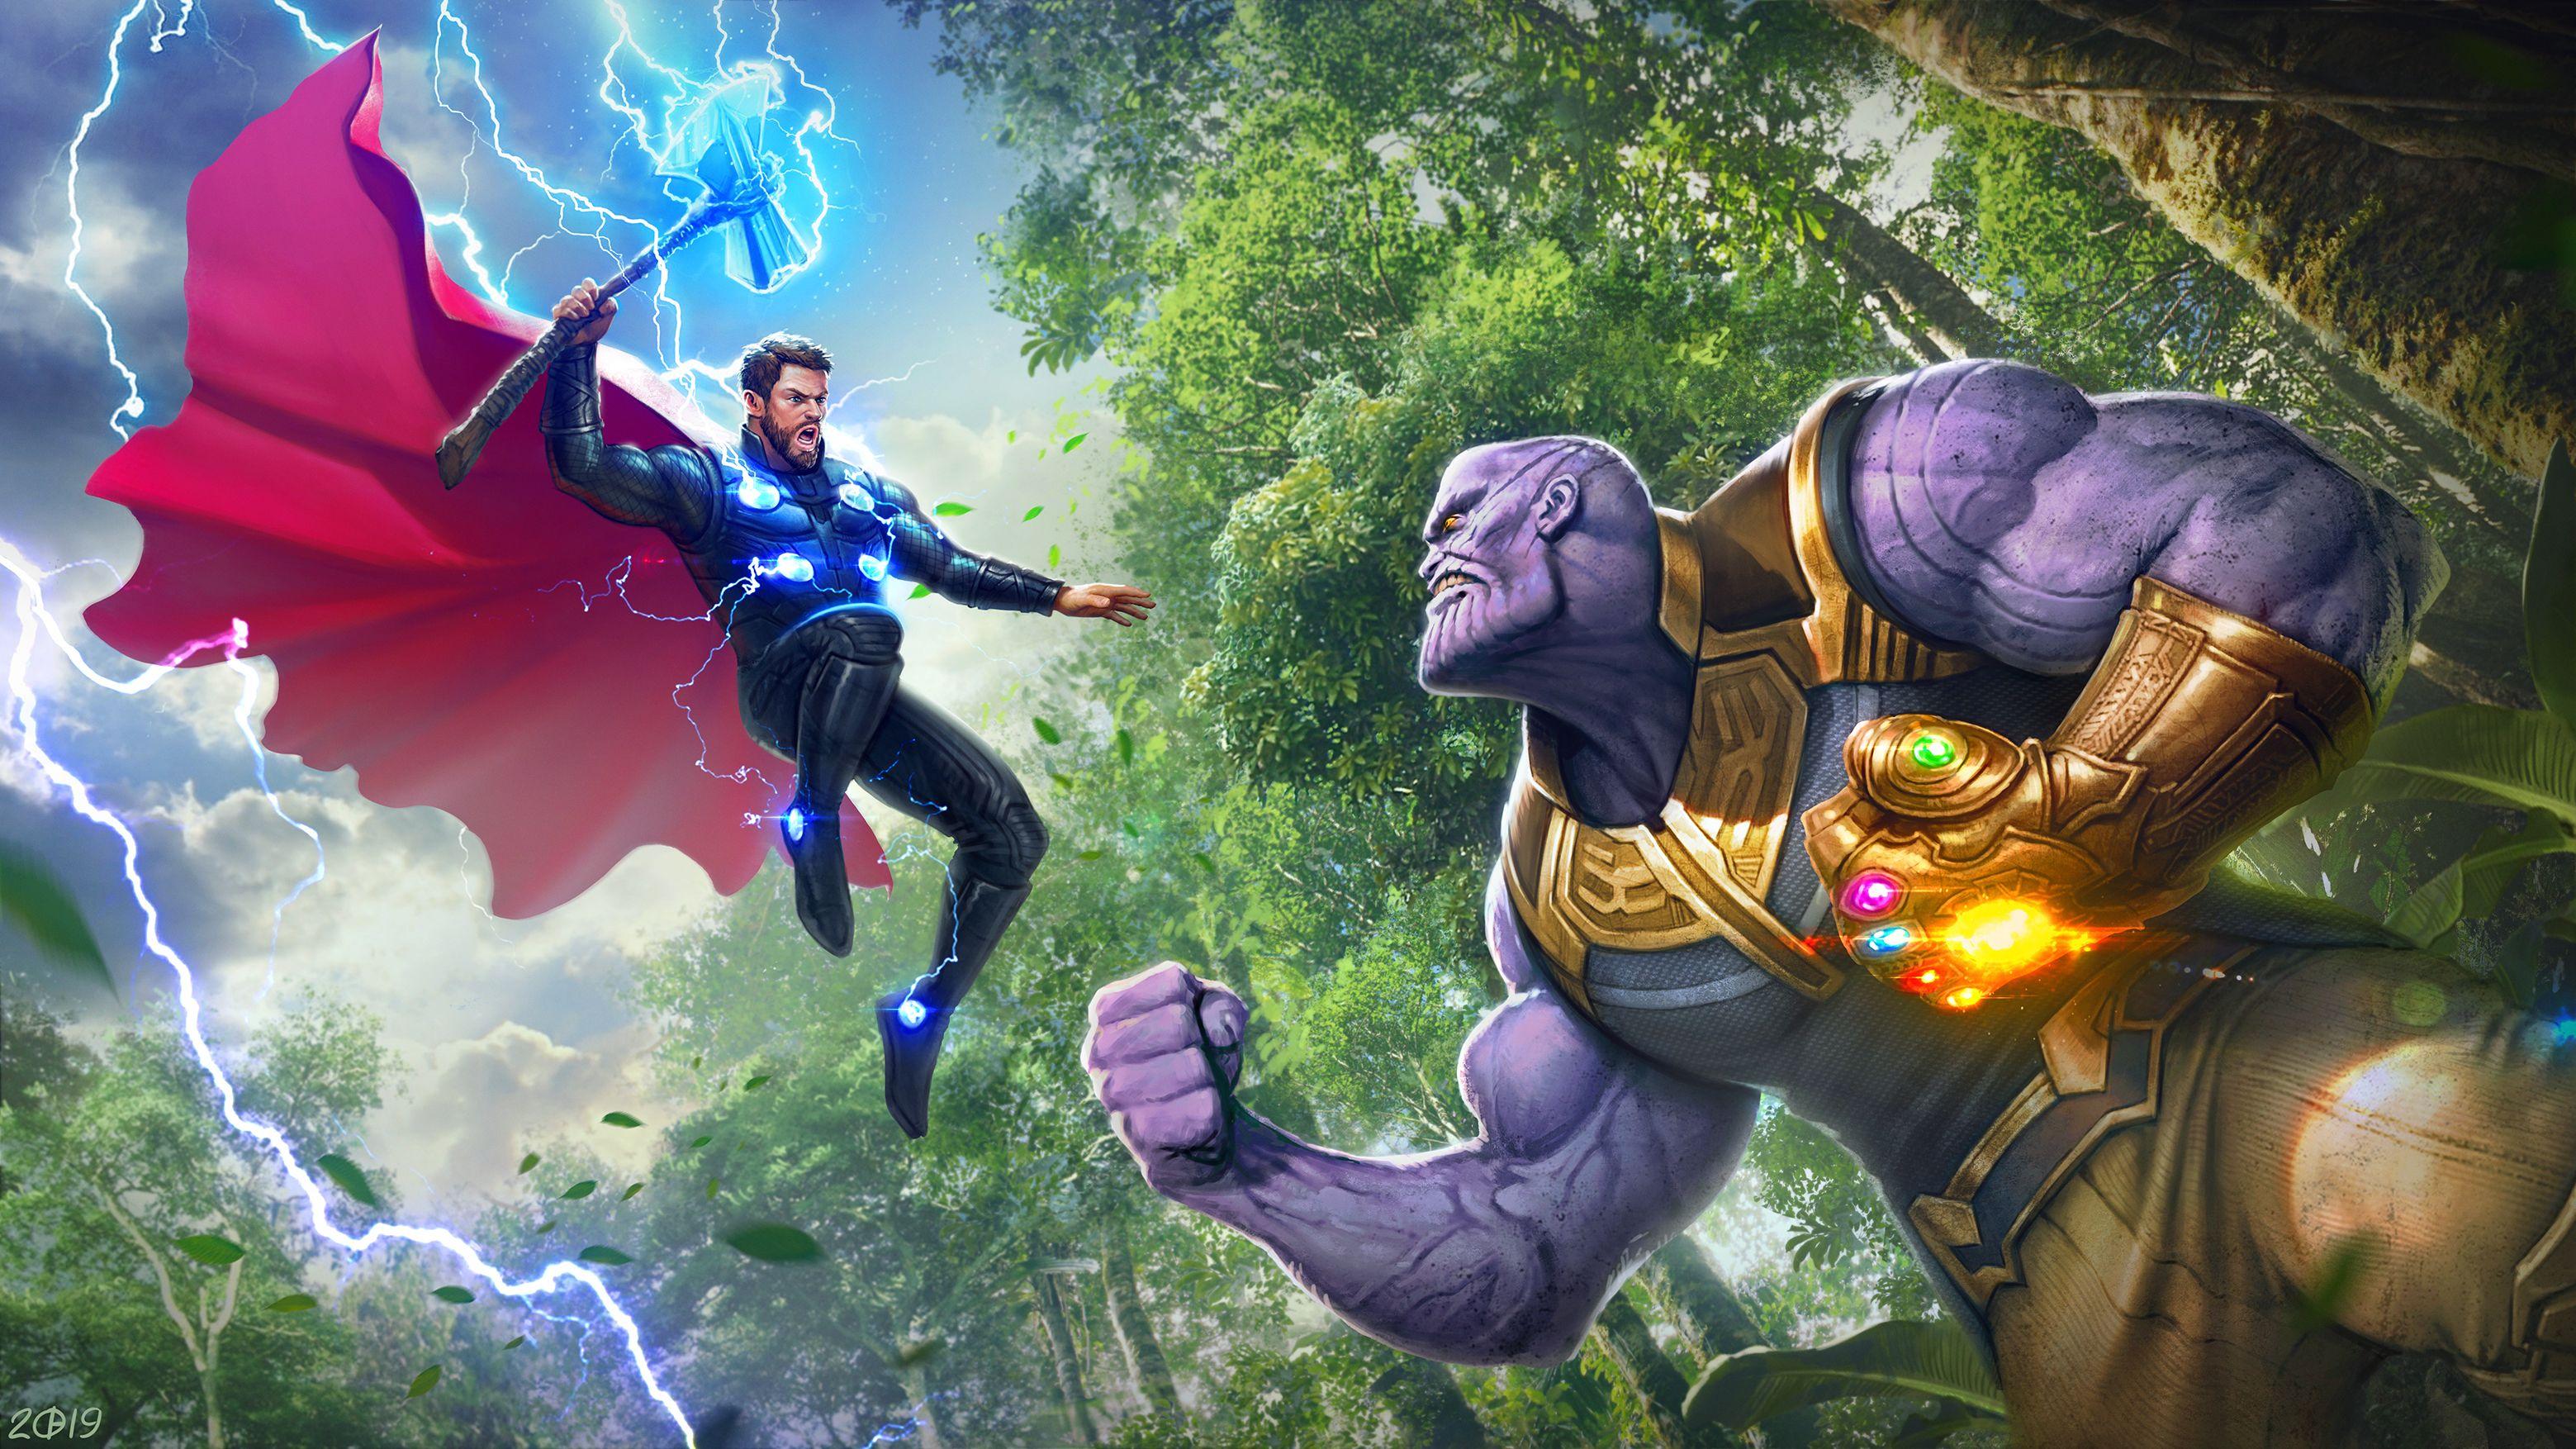 Thor Vs Thanos 4k Thor Vs Thanos Marvel Drawings Marvel Wallpaper